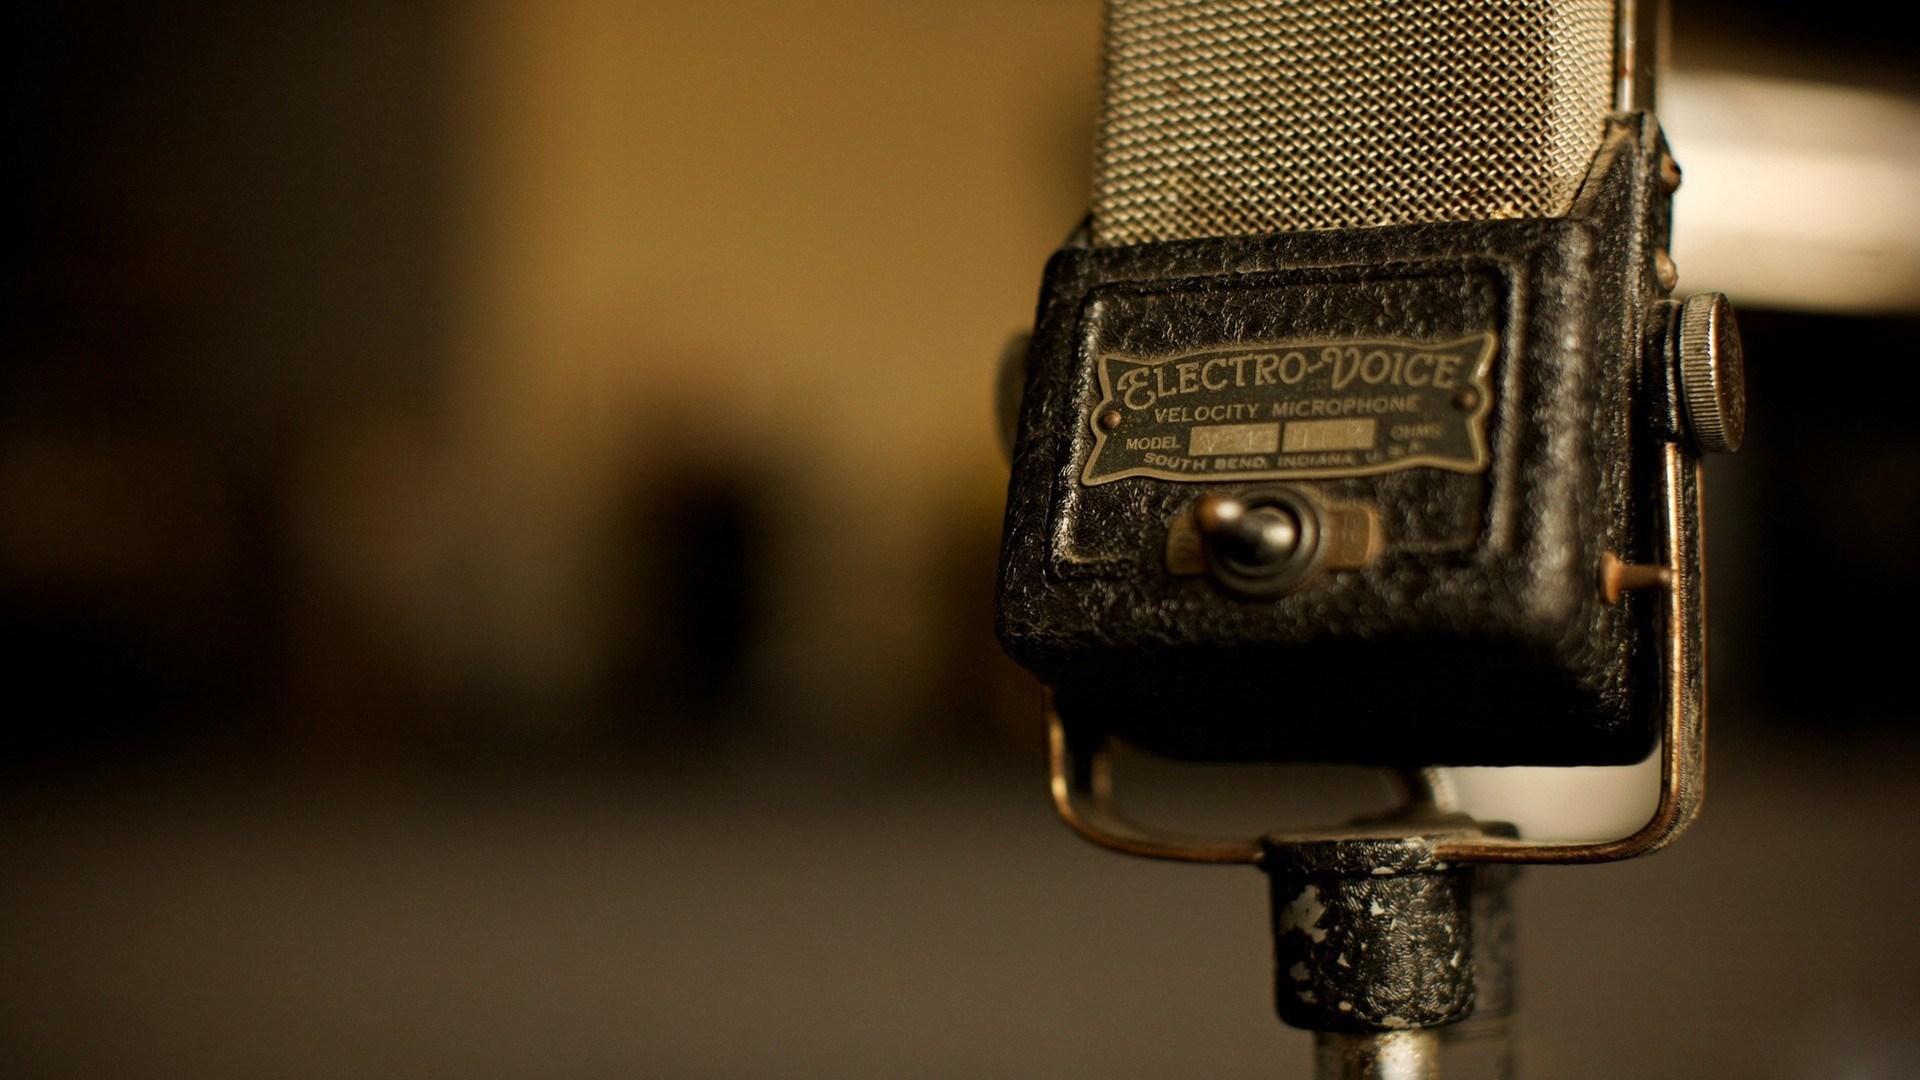 6968865-microphone-vintage-old-music